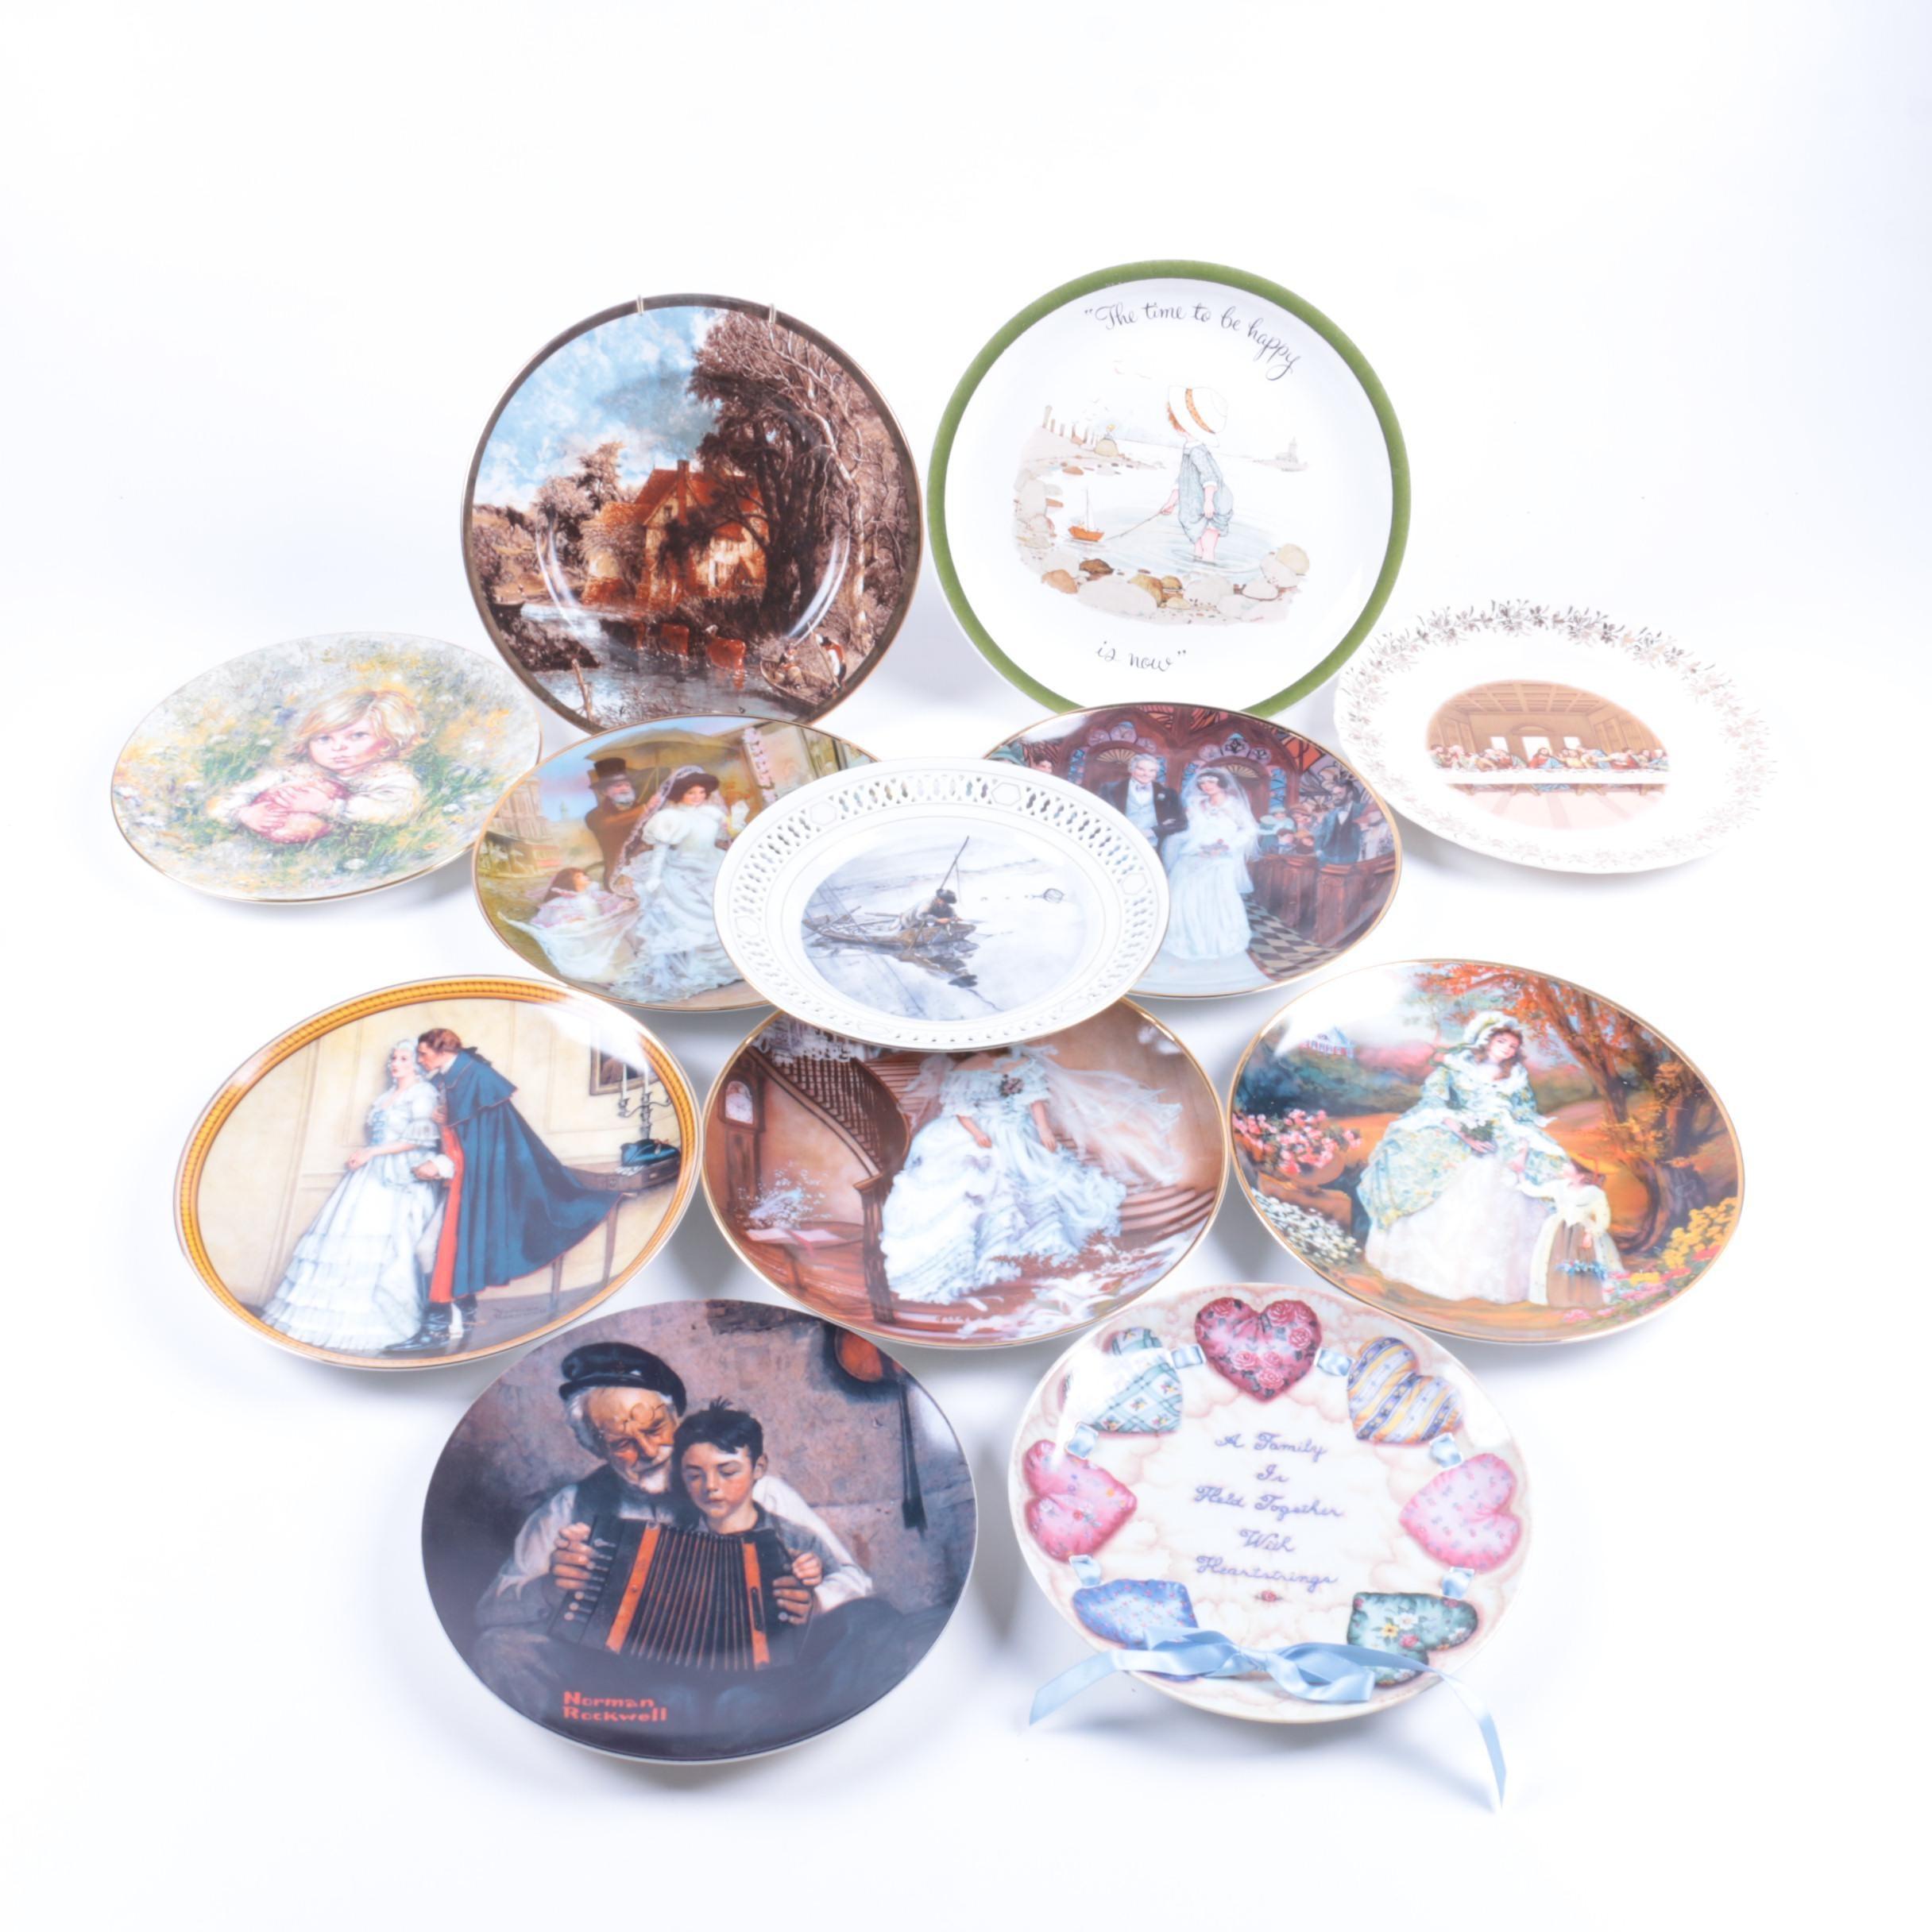 Decorative Ceramic Plate Collection